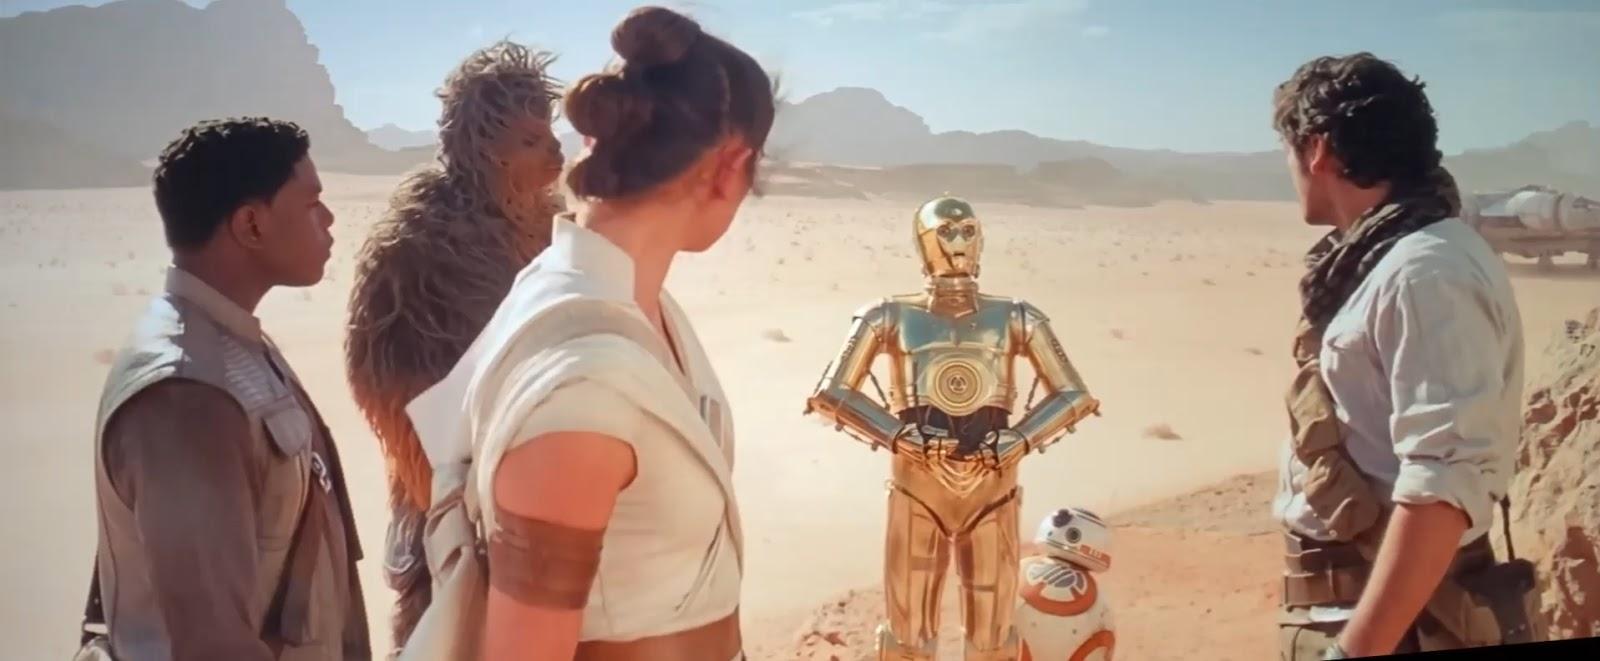 Star+Wars+El+ascenso+de+Skywalker+%282019%29+HDTS+1080p+Latino+-+Ingles.mkv_snapshot_00.22.05.633.jpg (1600×661)